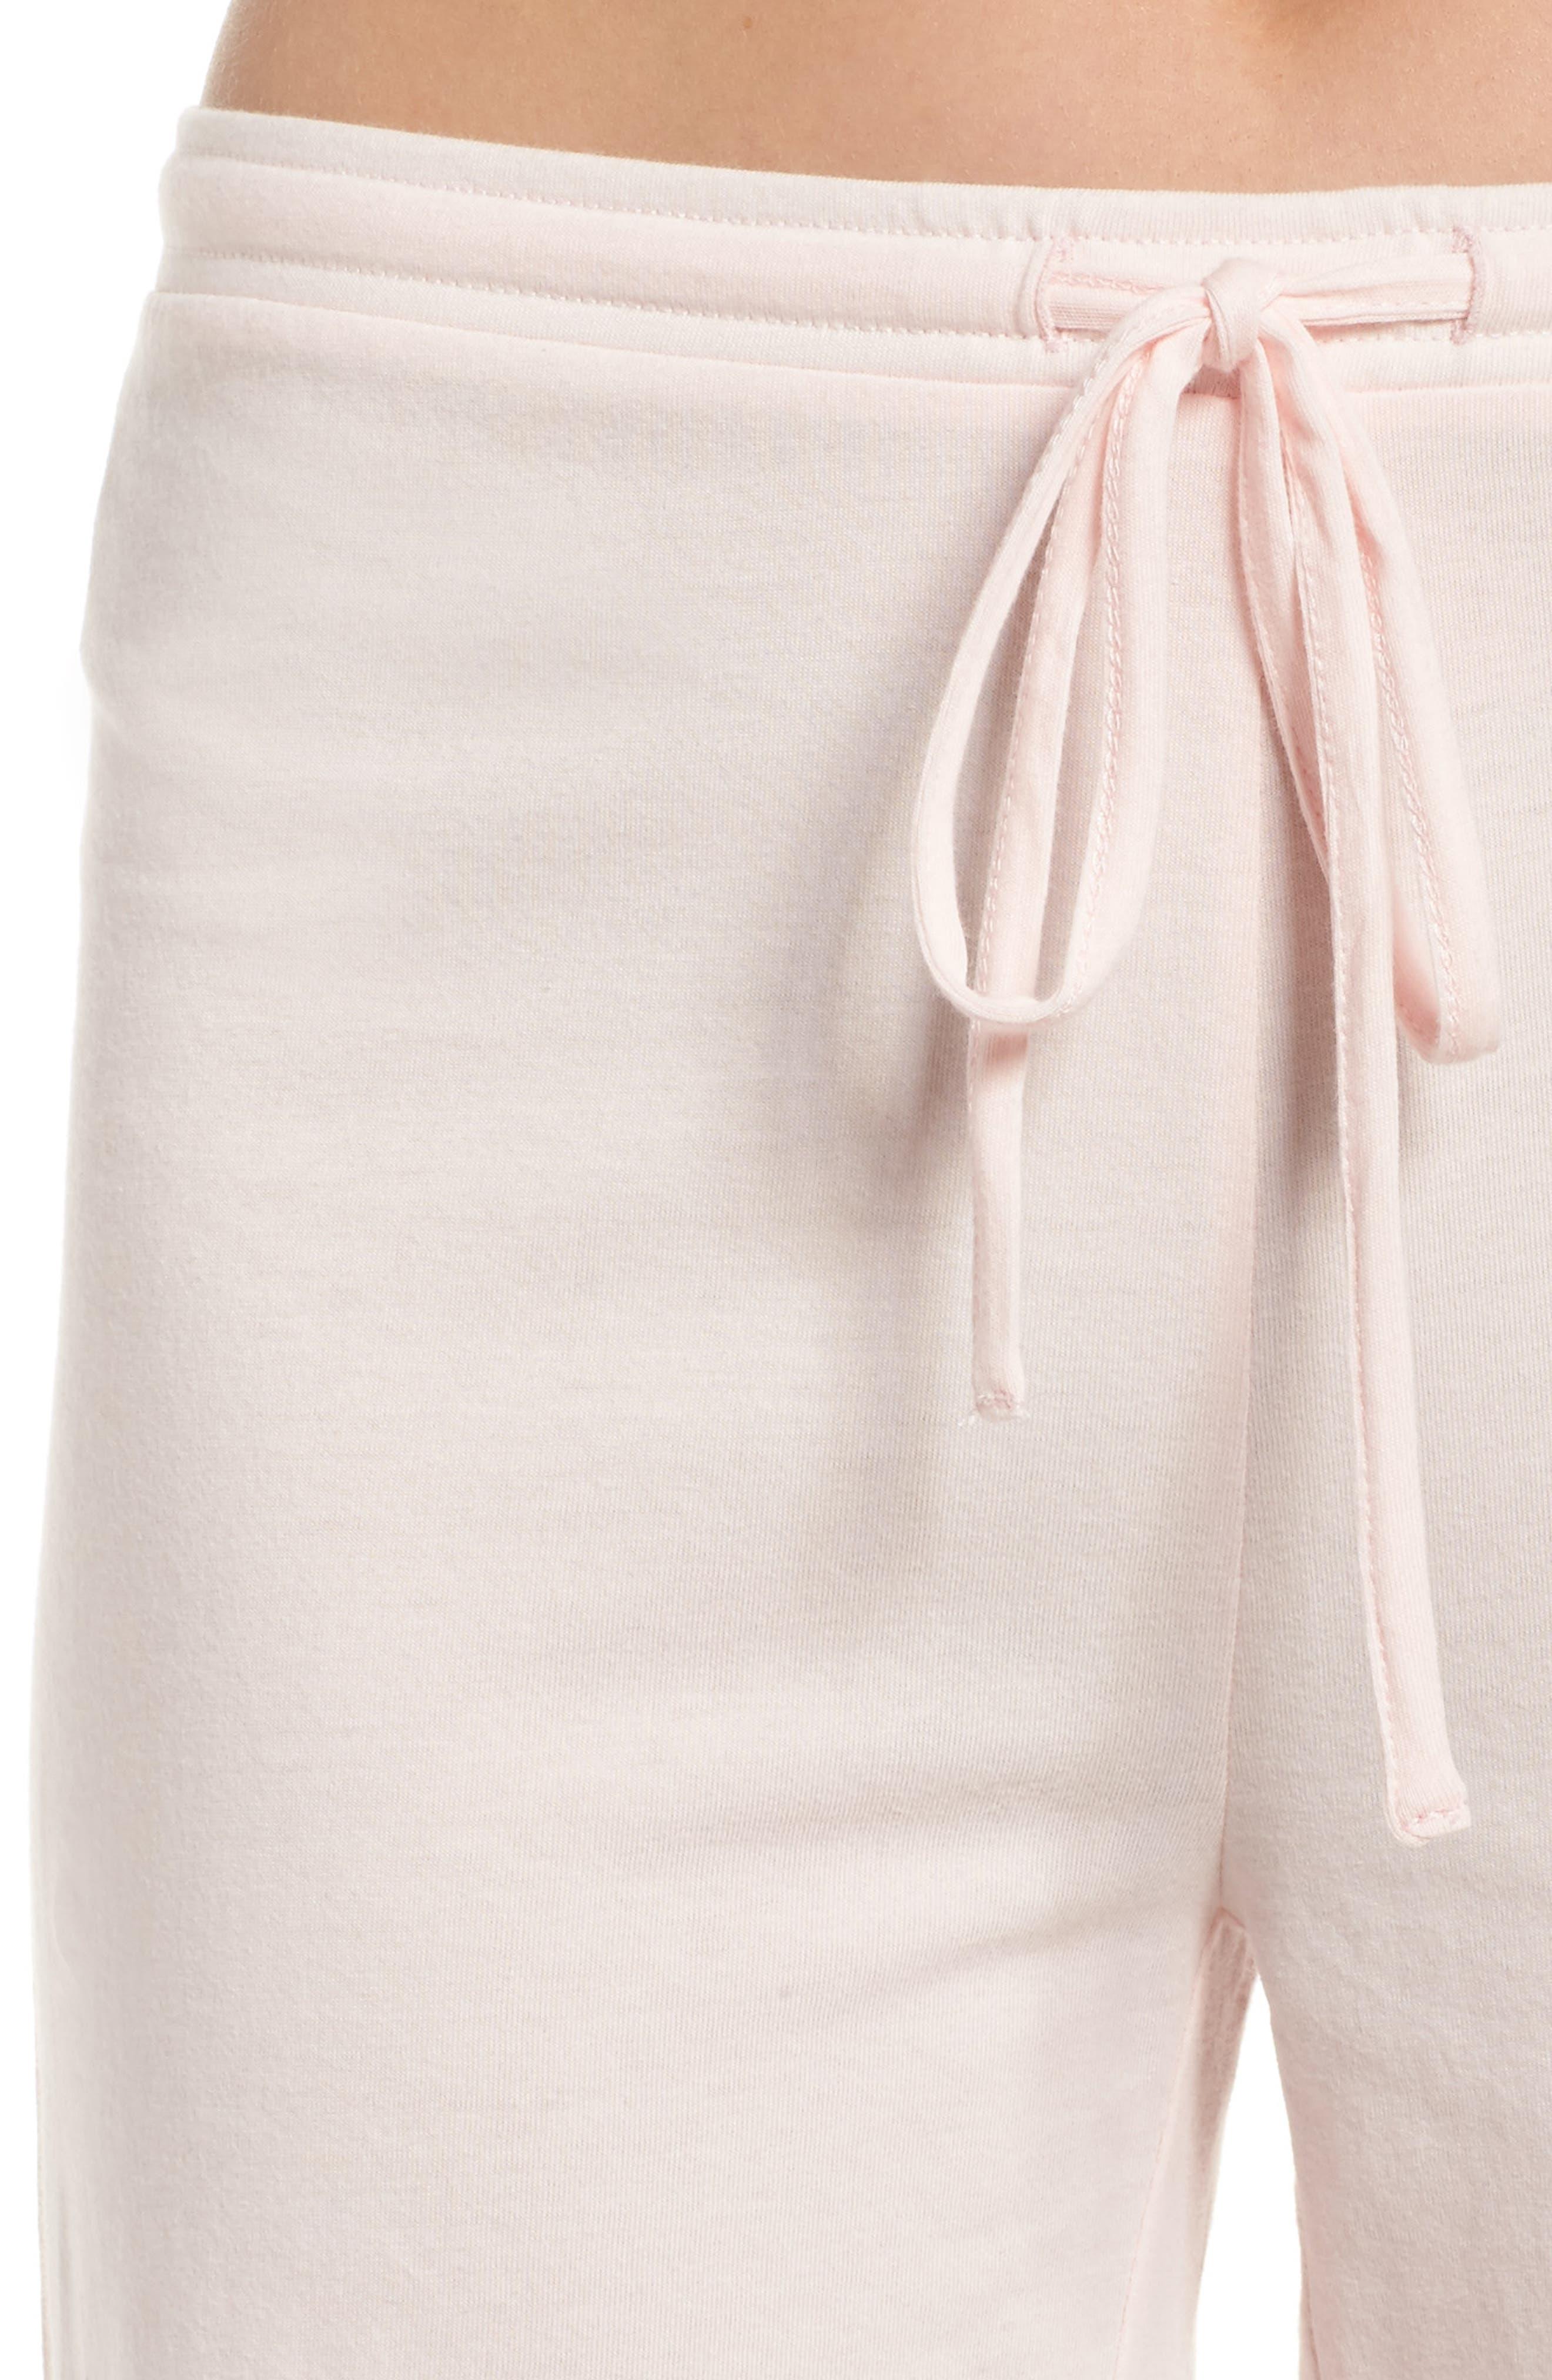 Breathe Lounge Pants,                             Alternate thumbnail 6, color,                             Pink Frosty